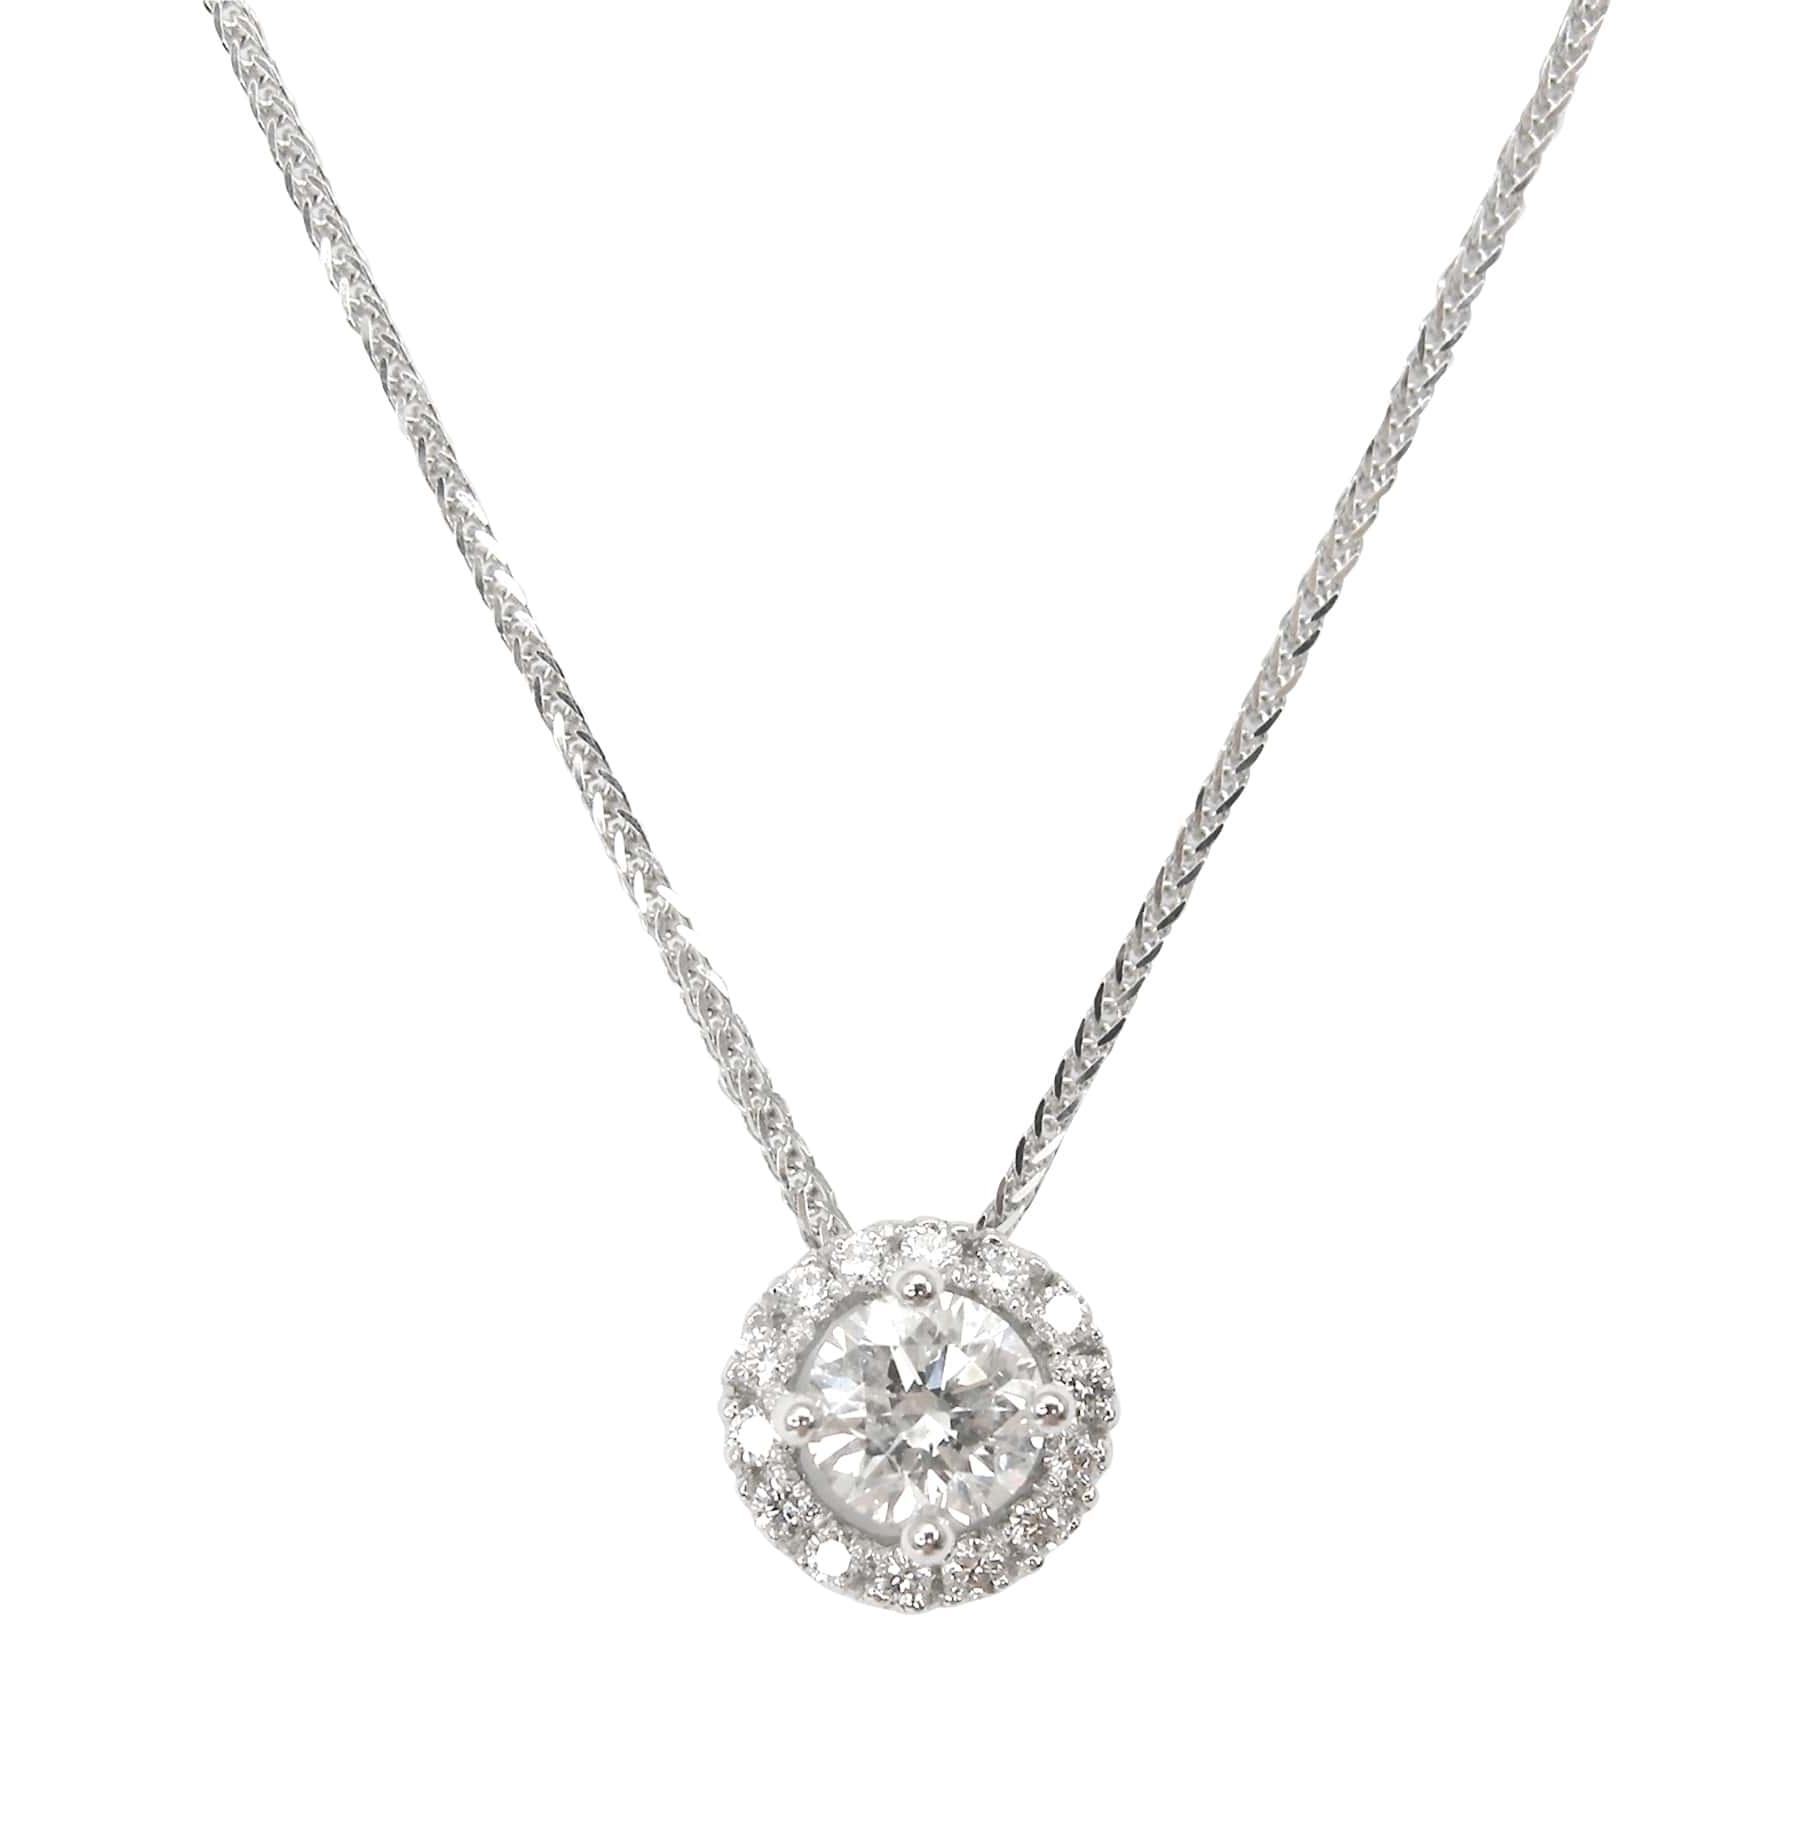 DIAMOND WITH HALO PENDANT BESPOKE FINE JEWELLERY BY SHAHINA HATTA